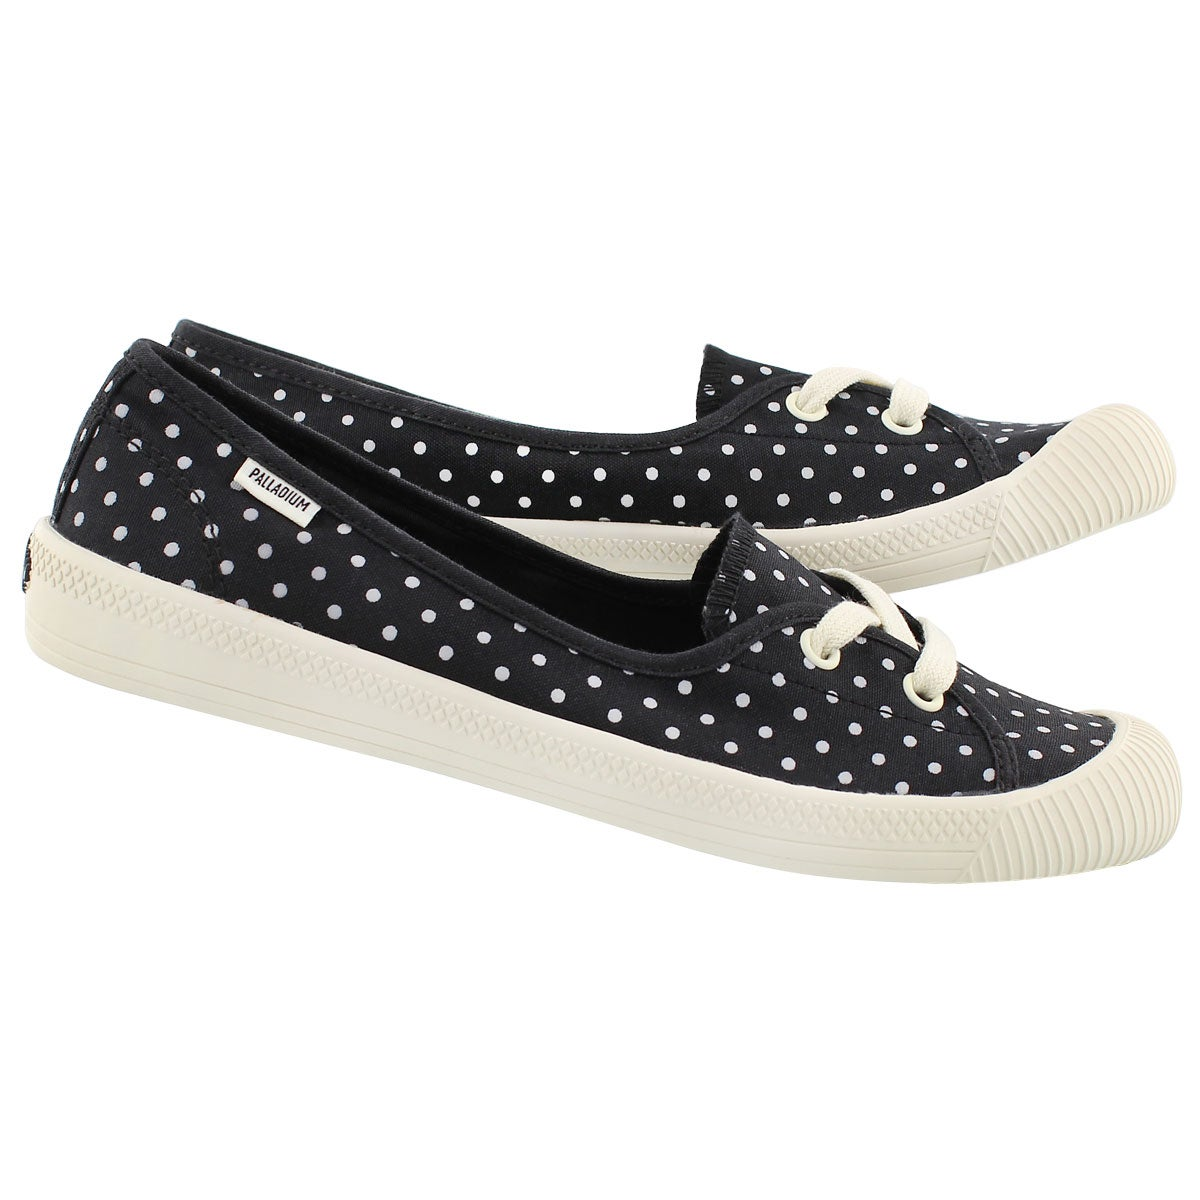 Lds Flex Ballet blk/wht dots sneaker